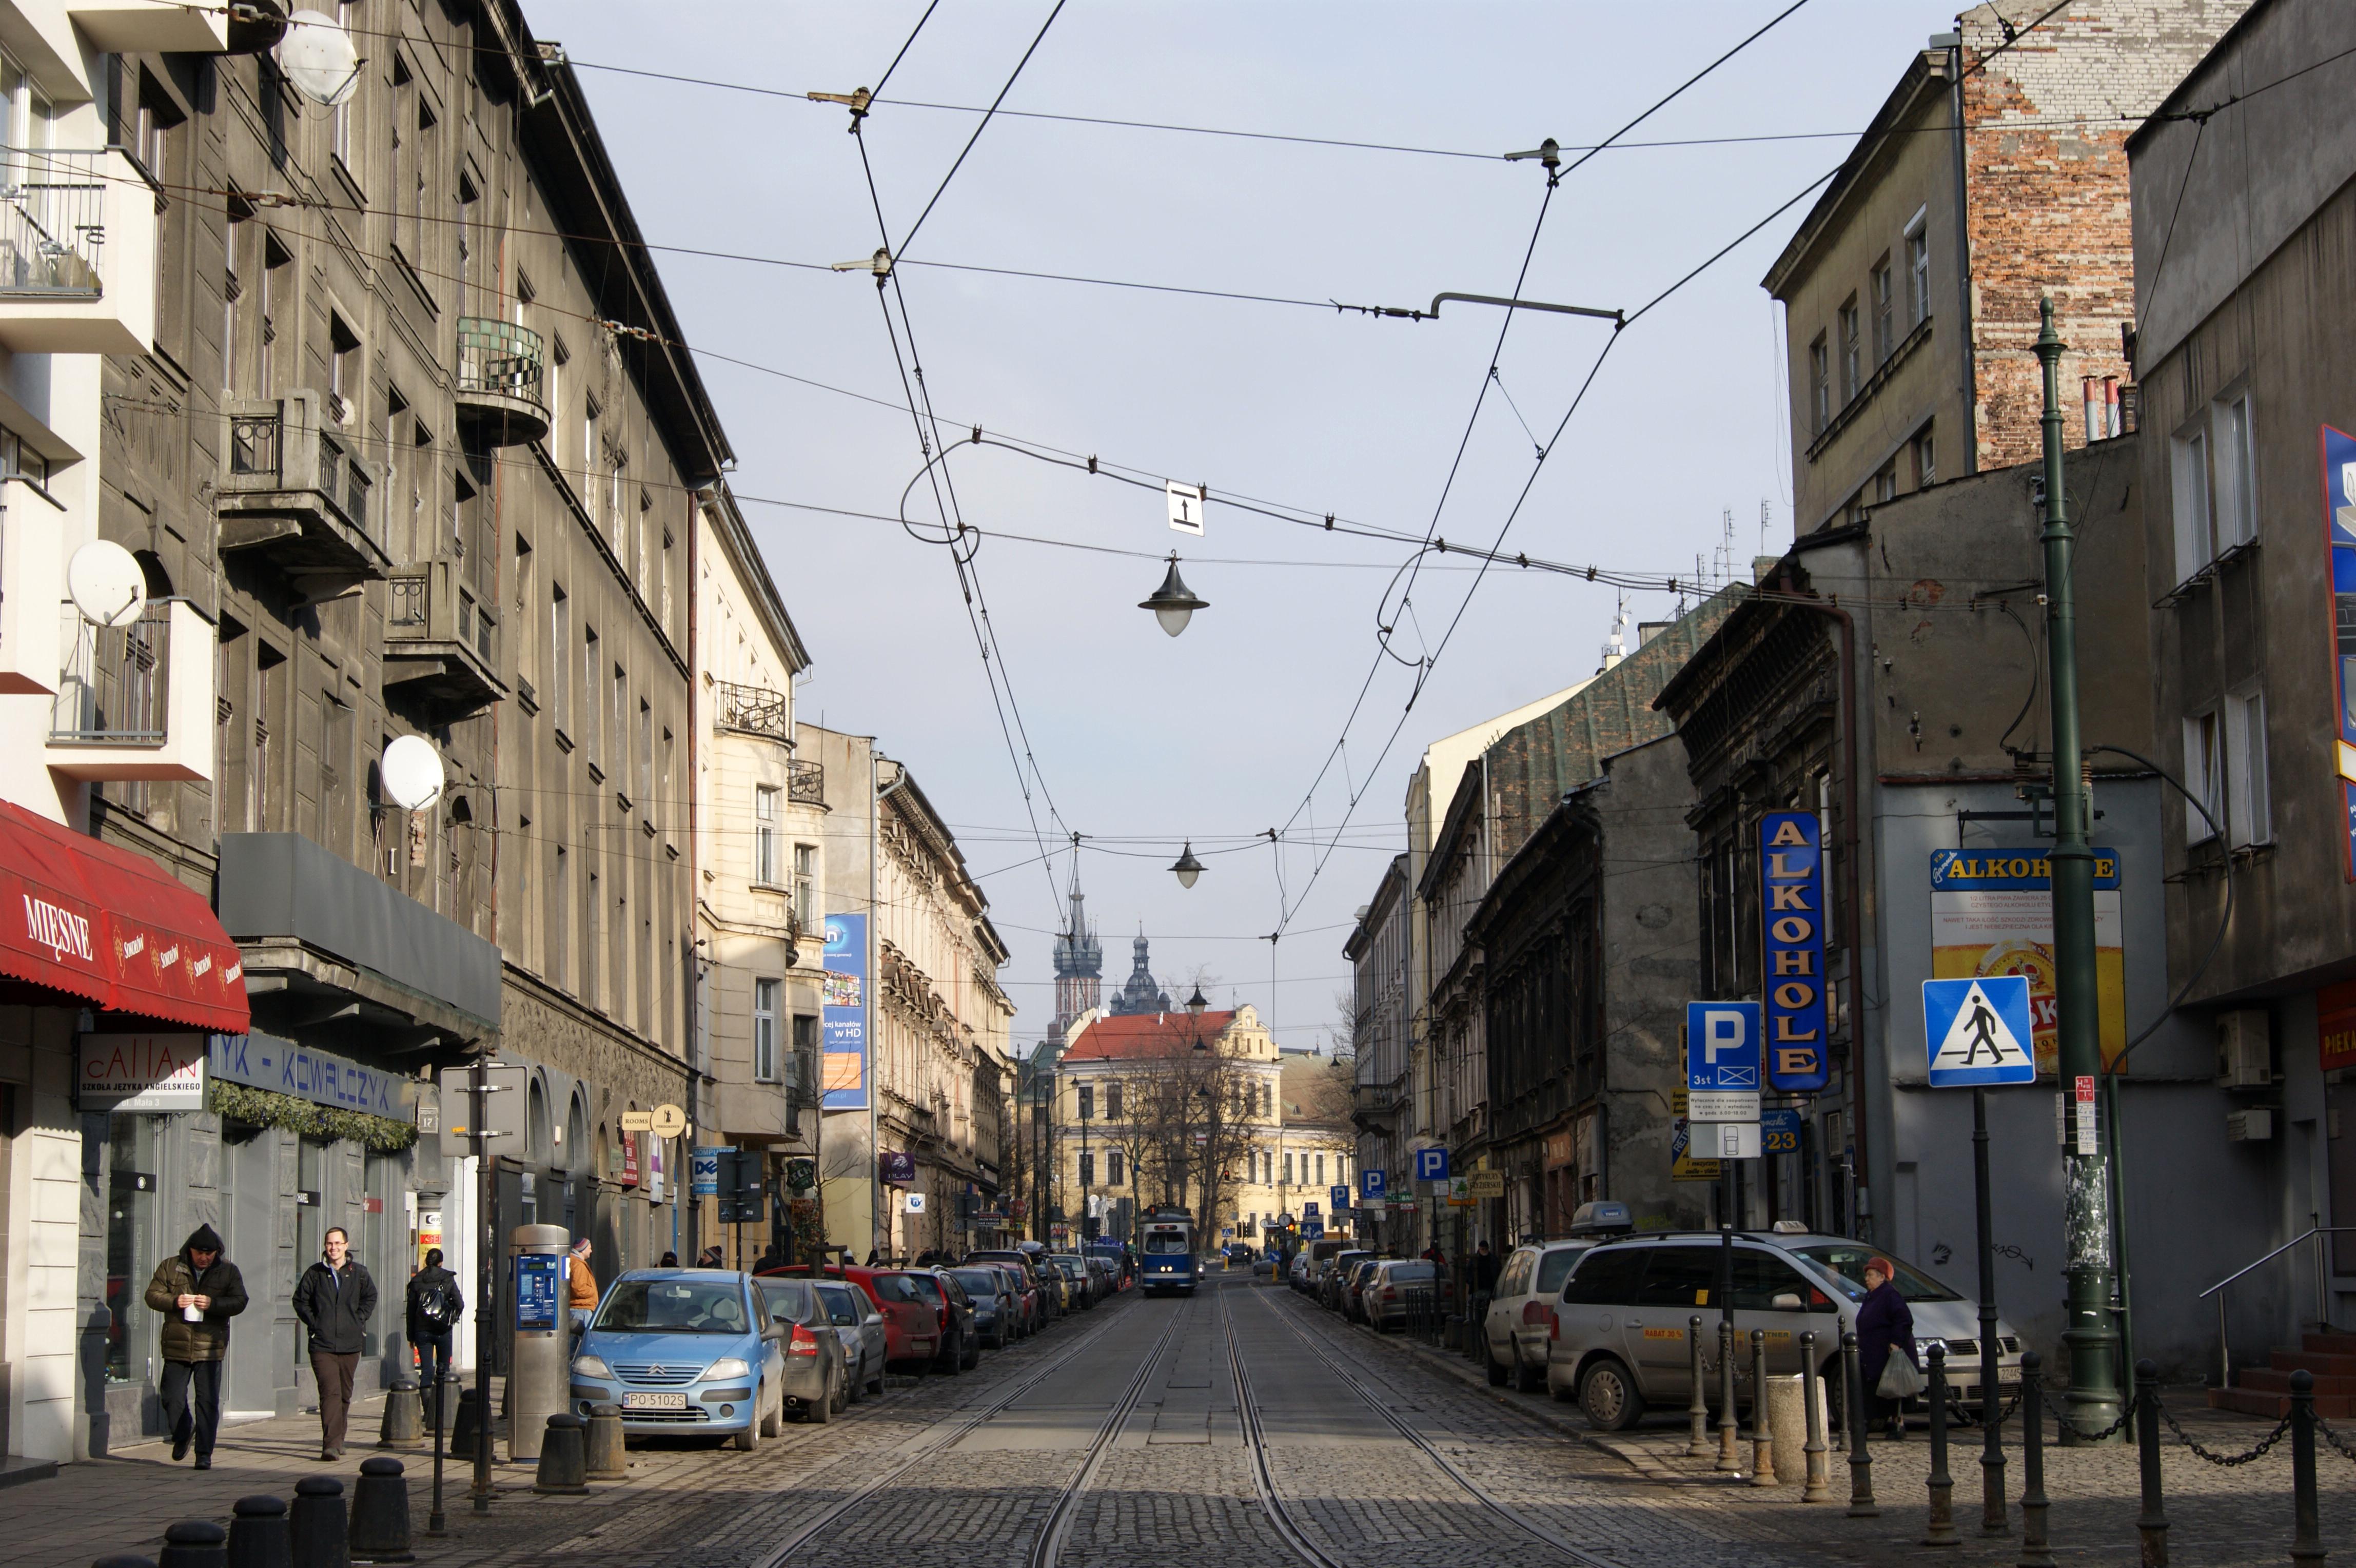 Poland As A Dog Eat Democration Susage